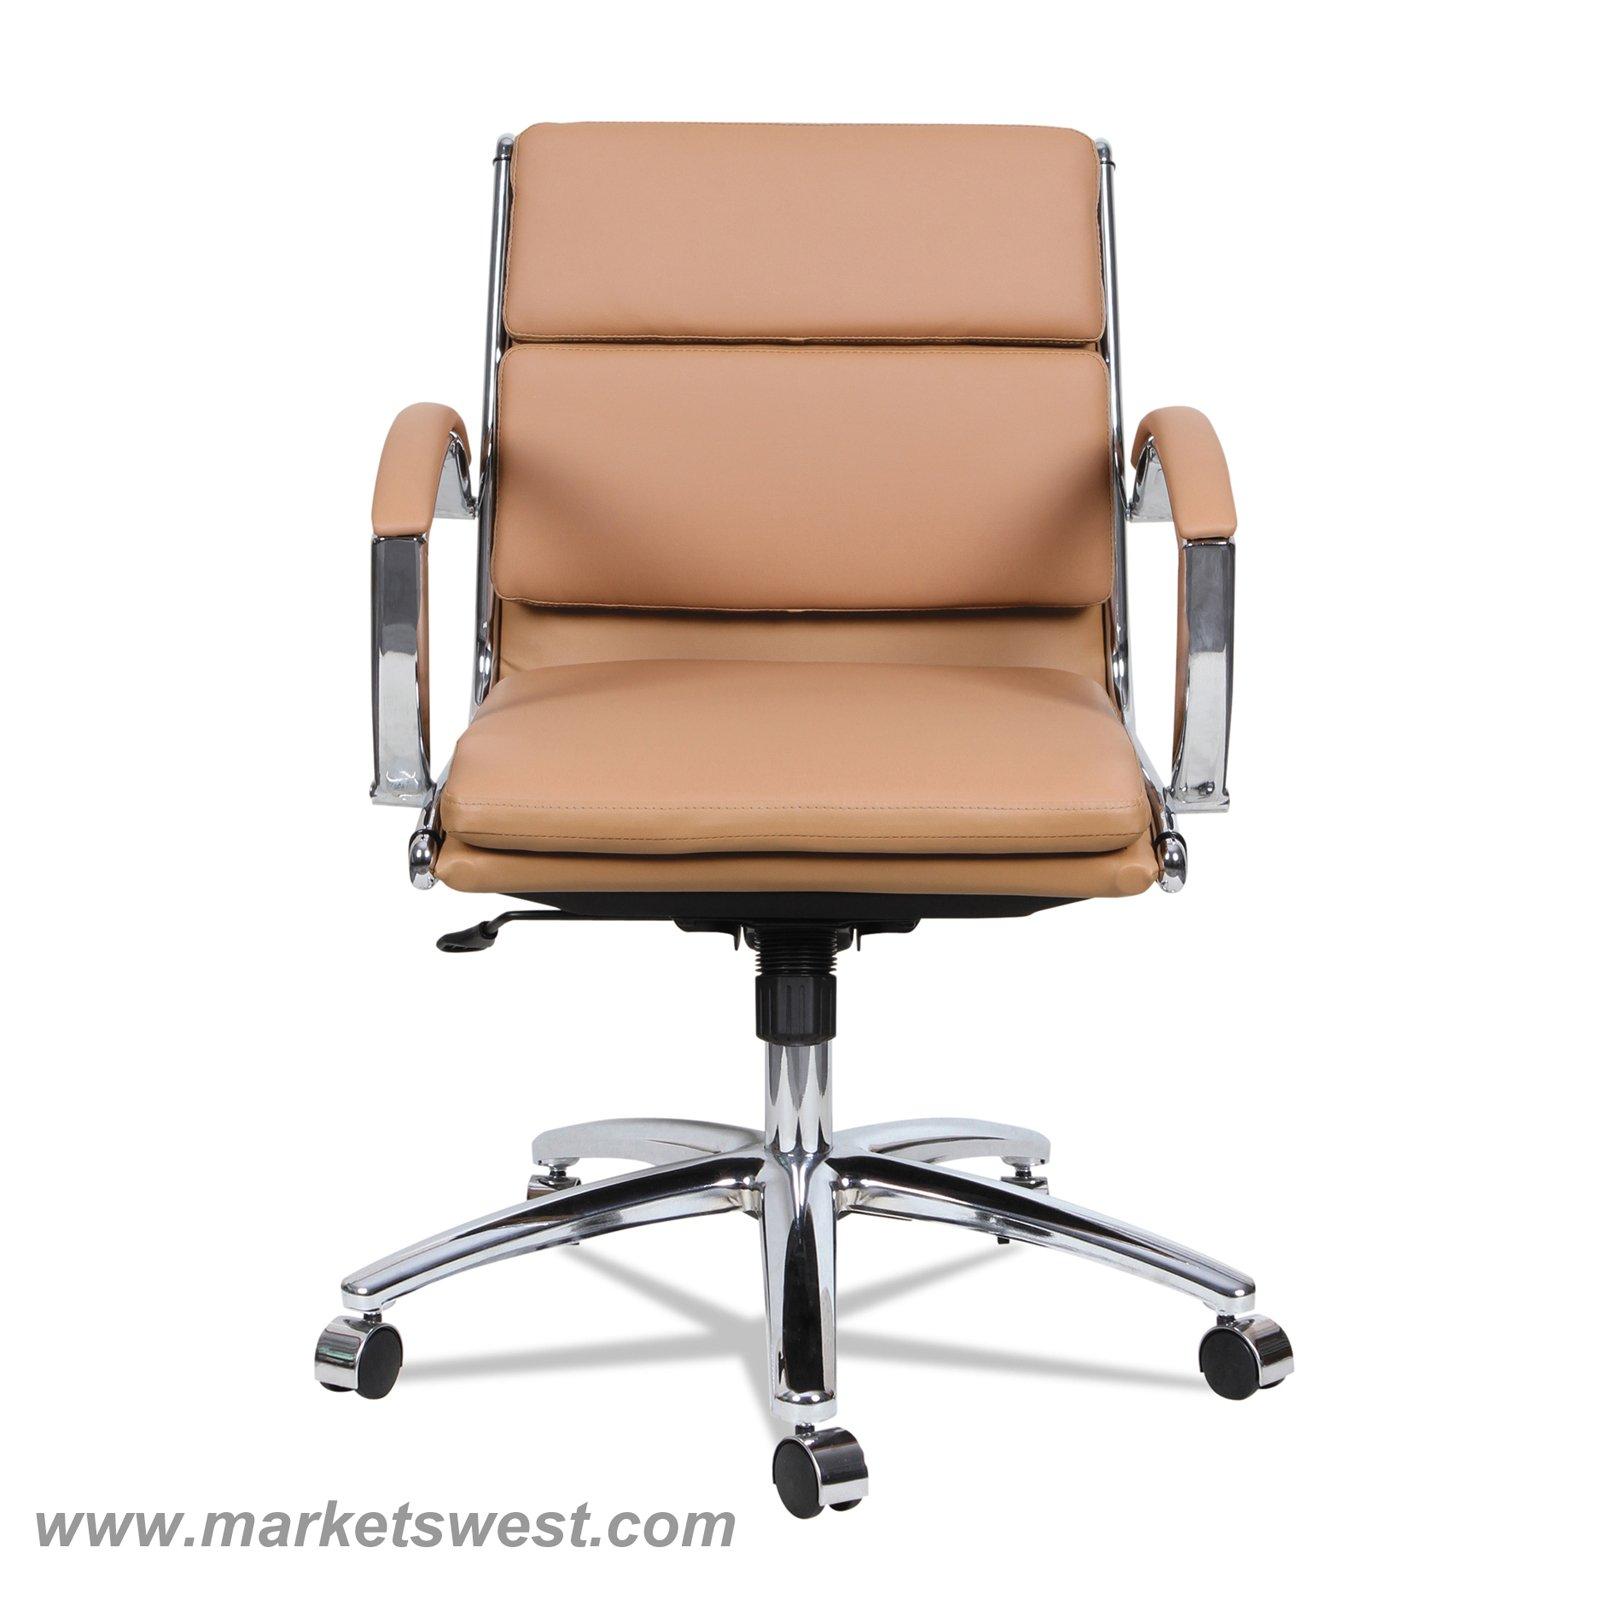 Neratoli Low Back Swivel Tilt Chair Red Soft Touch Leather Chrome Frame